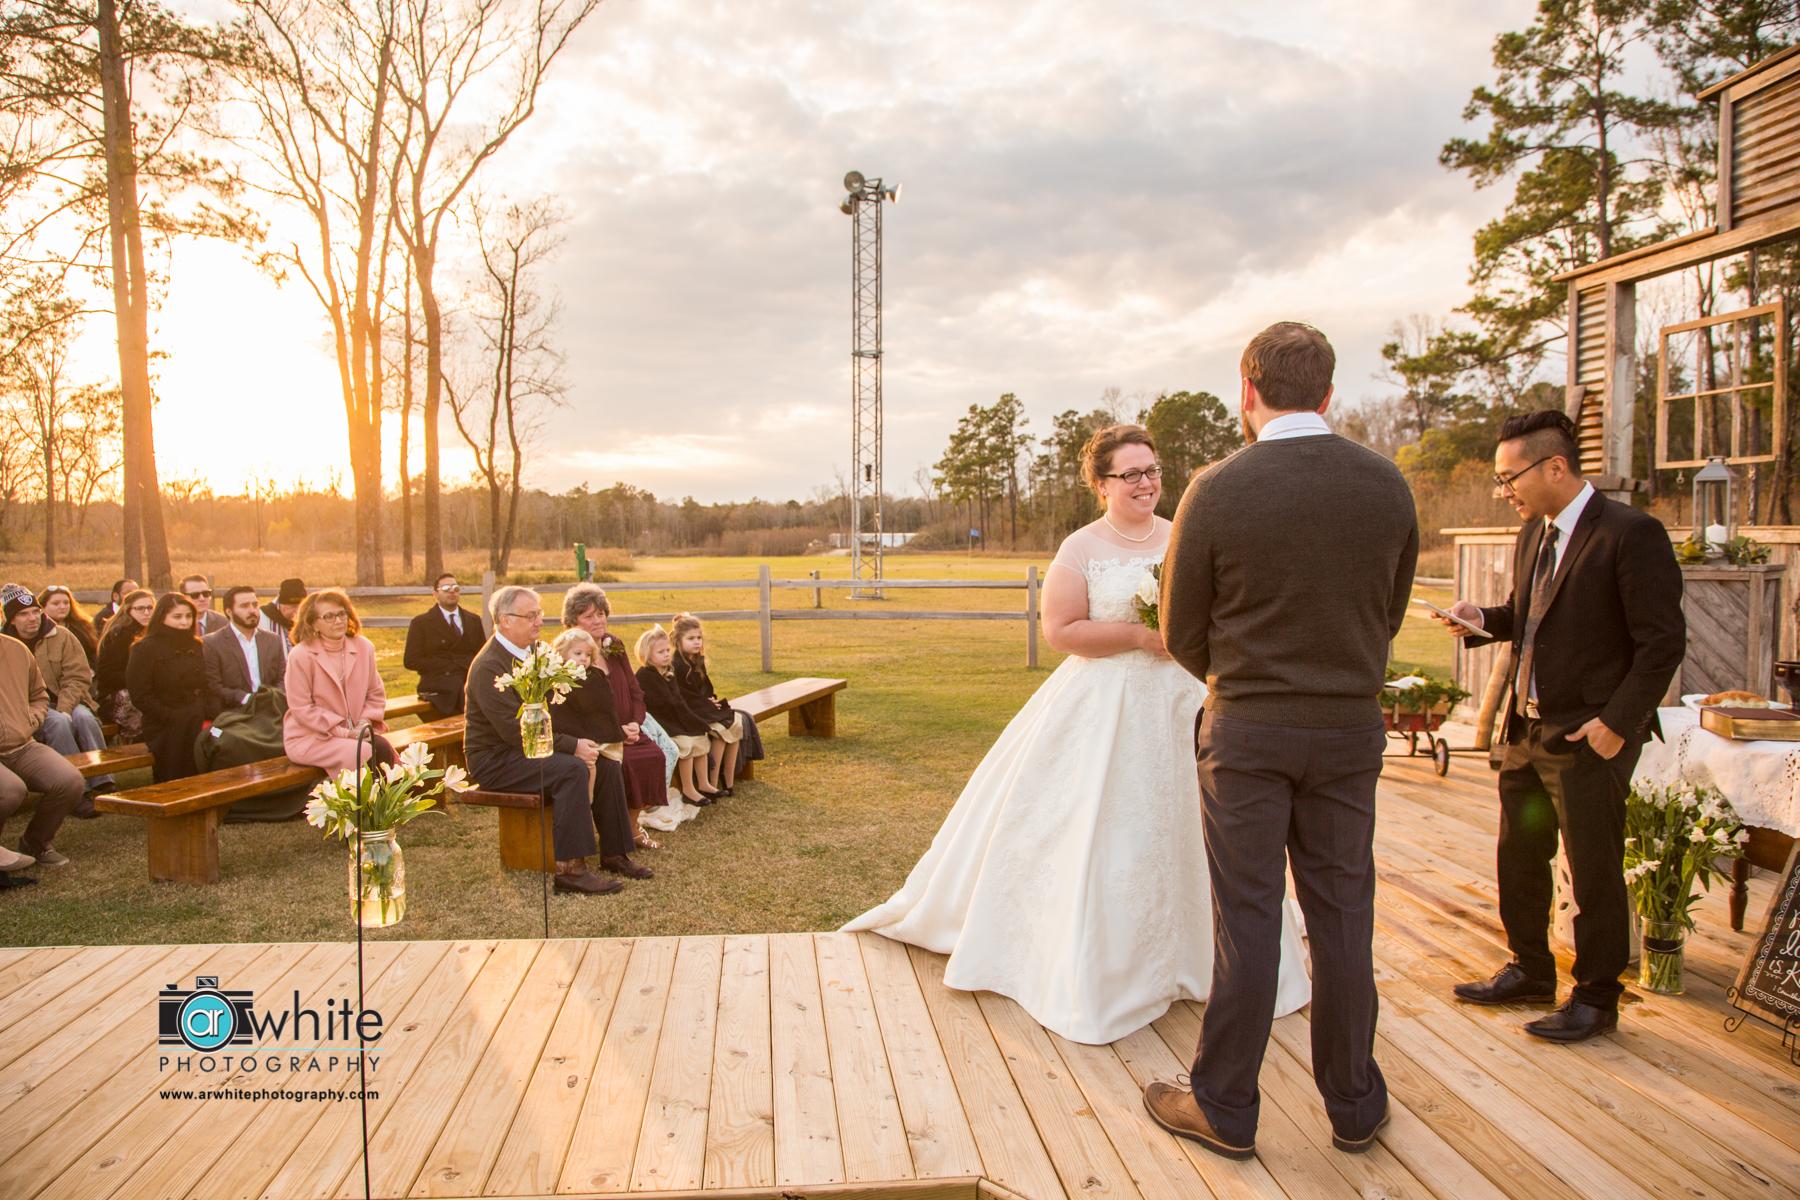 Barn wedding ceremony at sunset.